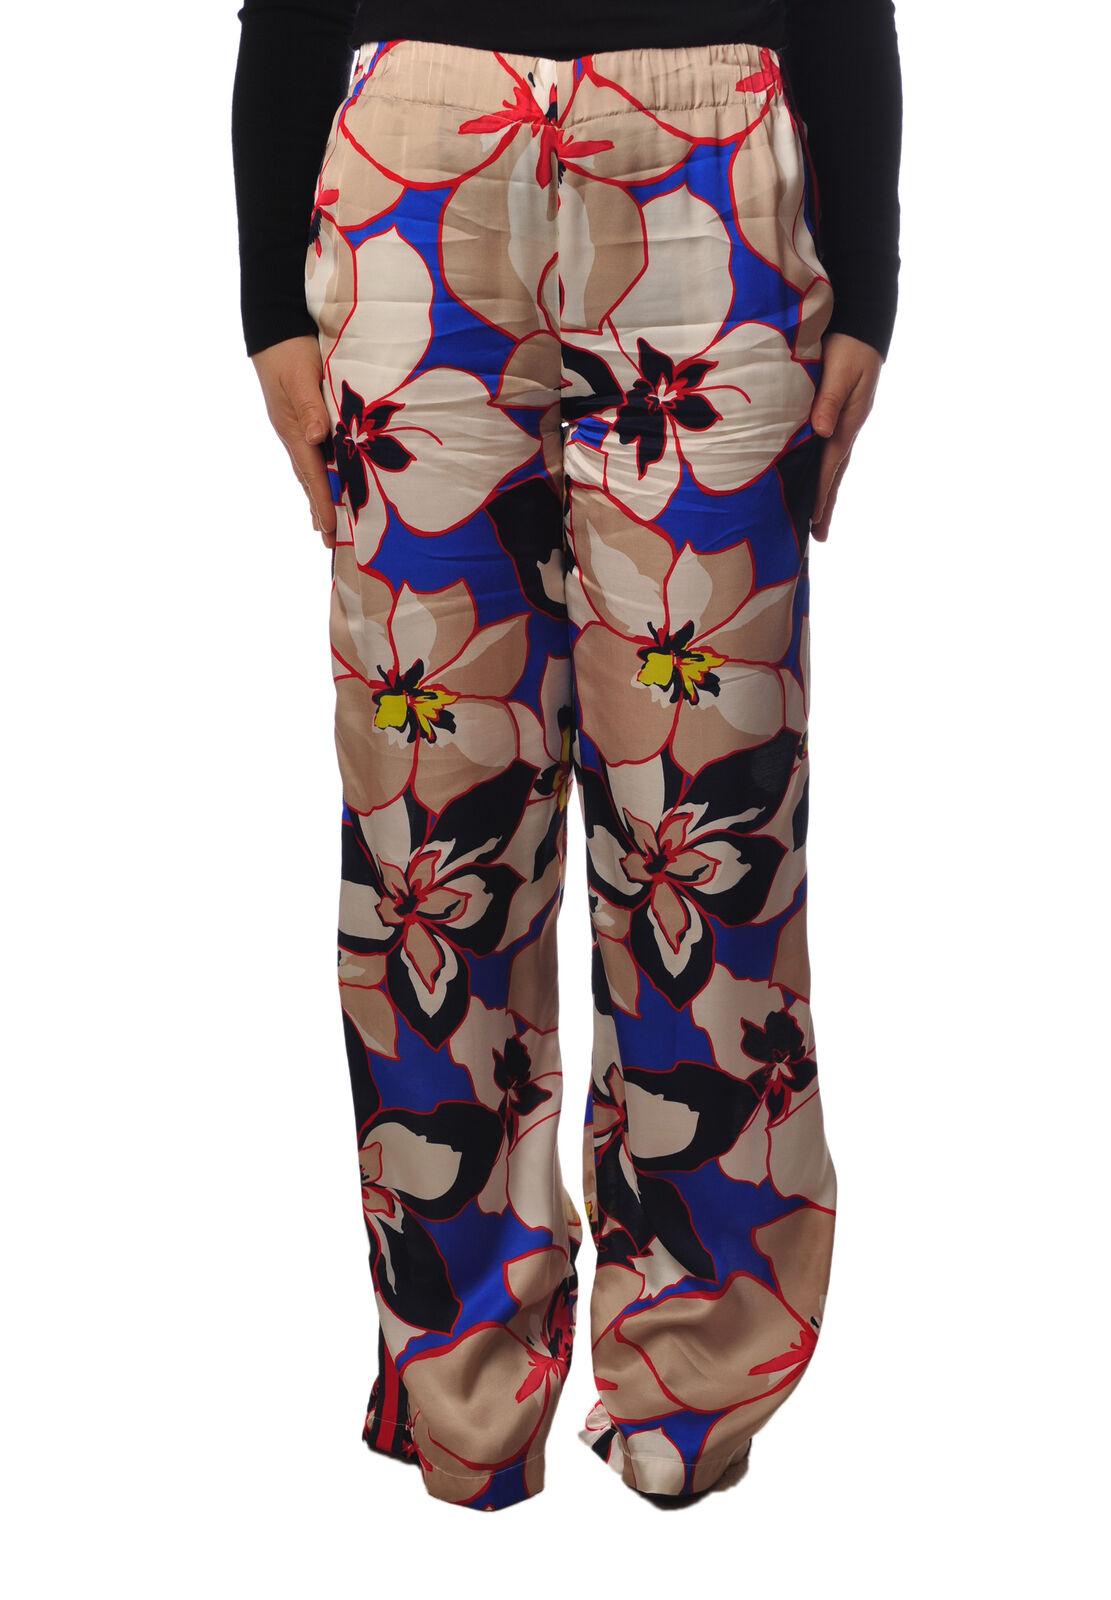 Ki 6 - Pants-Pants  - Woman - Fantasy - 4969426E184607  oferta especial